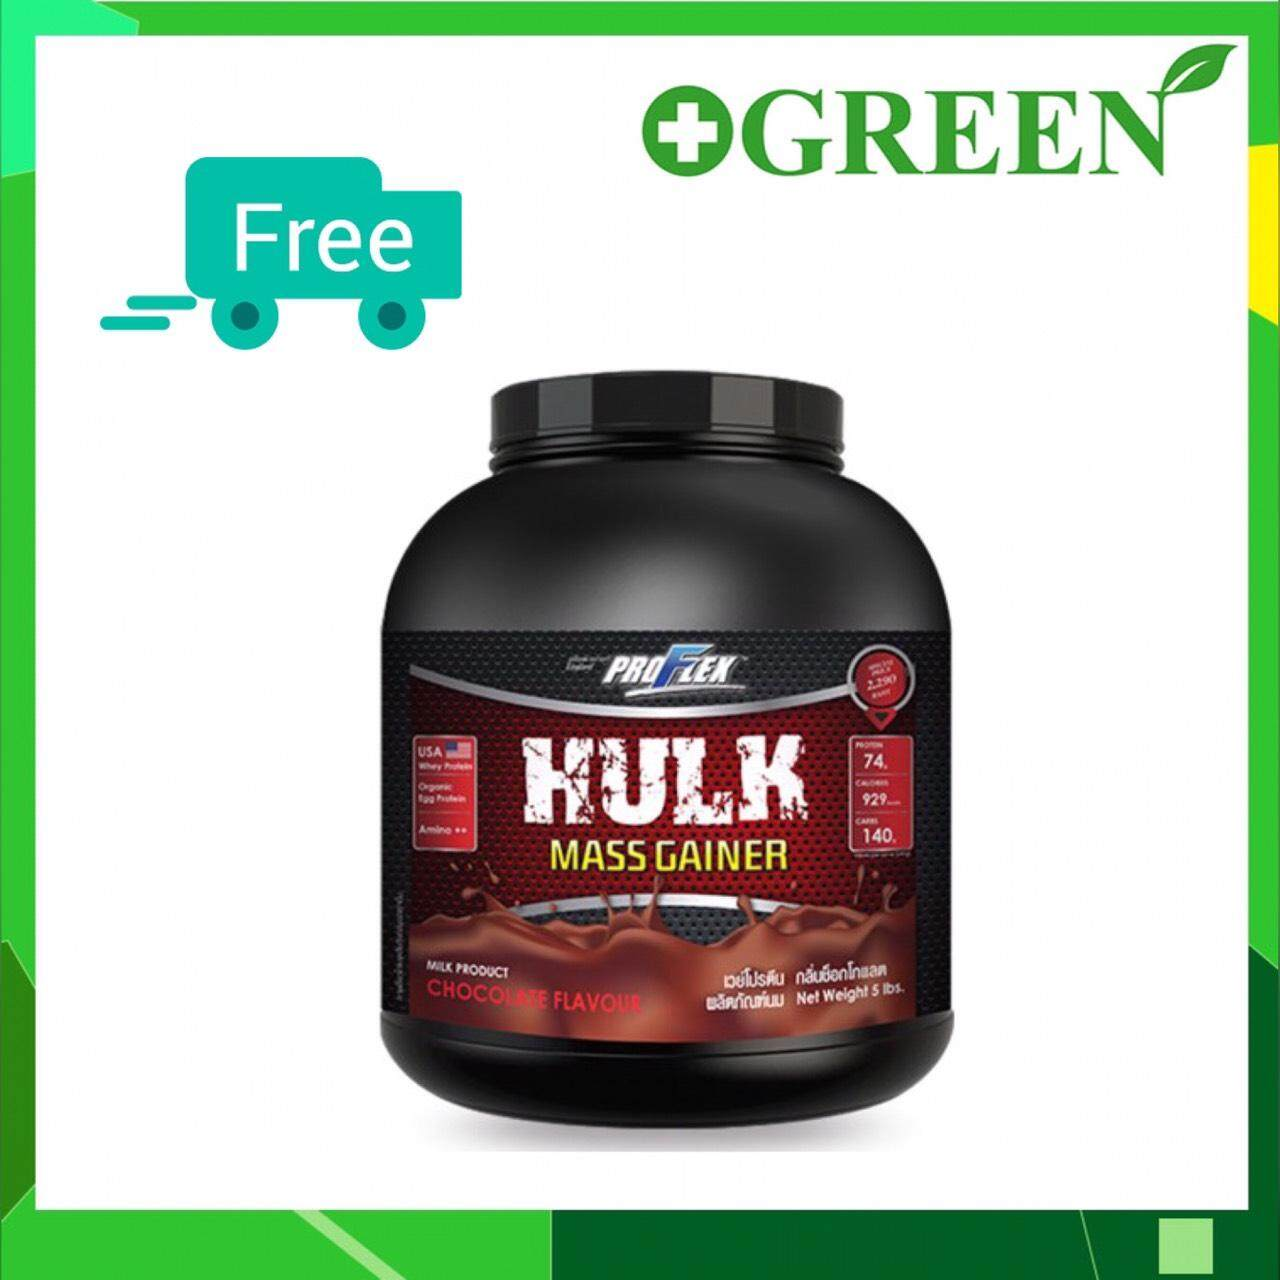 Proflex Hulk Mass Gainer Chocolate 5 Ibs เวย์ โปรตีน ฮัลค์ แมสเกนเนอร์ กลิ่นช็อกโกแลต ปริมาณ 5 ปอนด์.